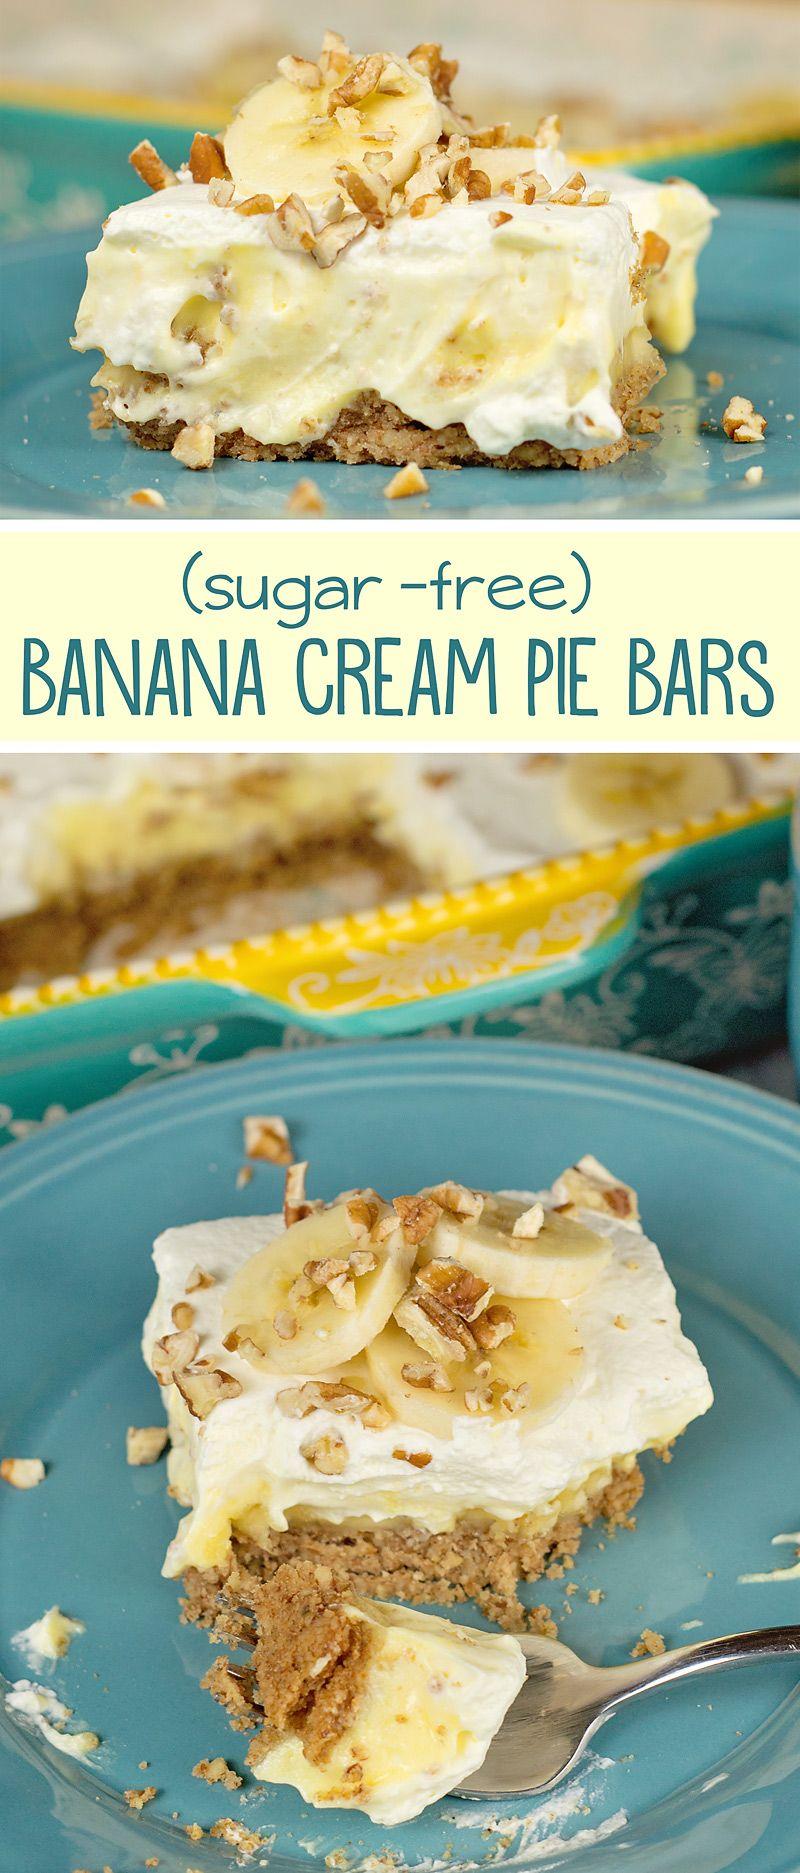 12+ Fearsome Gestational Diabetes Breakfast Ideas #sugarfreedesserts